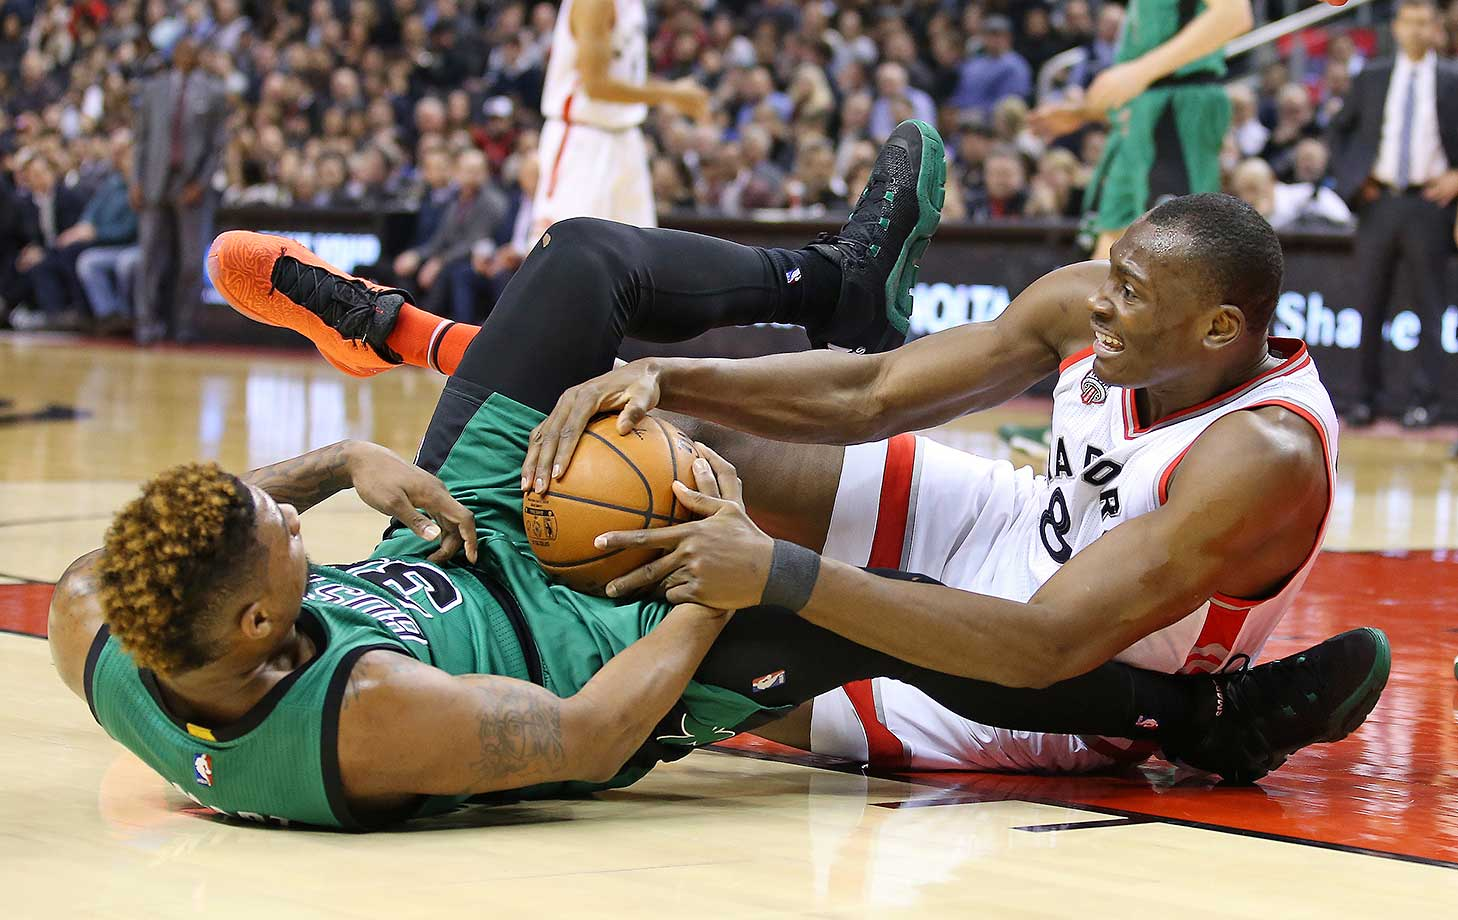 Marcus Smart of the Boston Celtics battles for a ball against Bismack Biyombo of the Toronto Raptors.